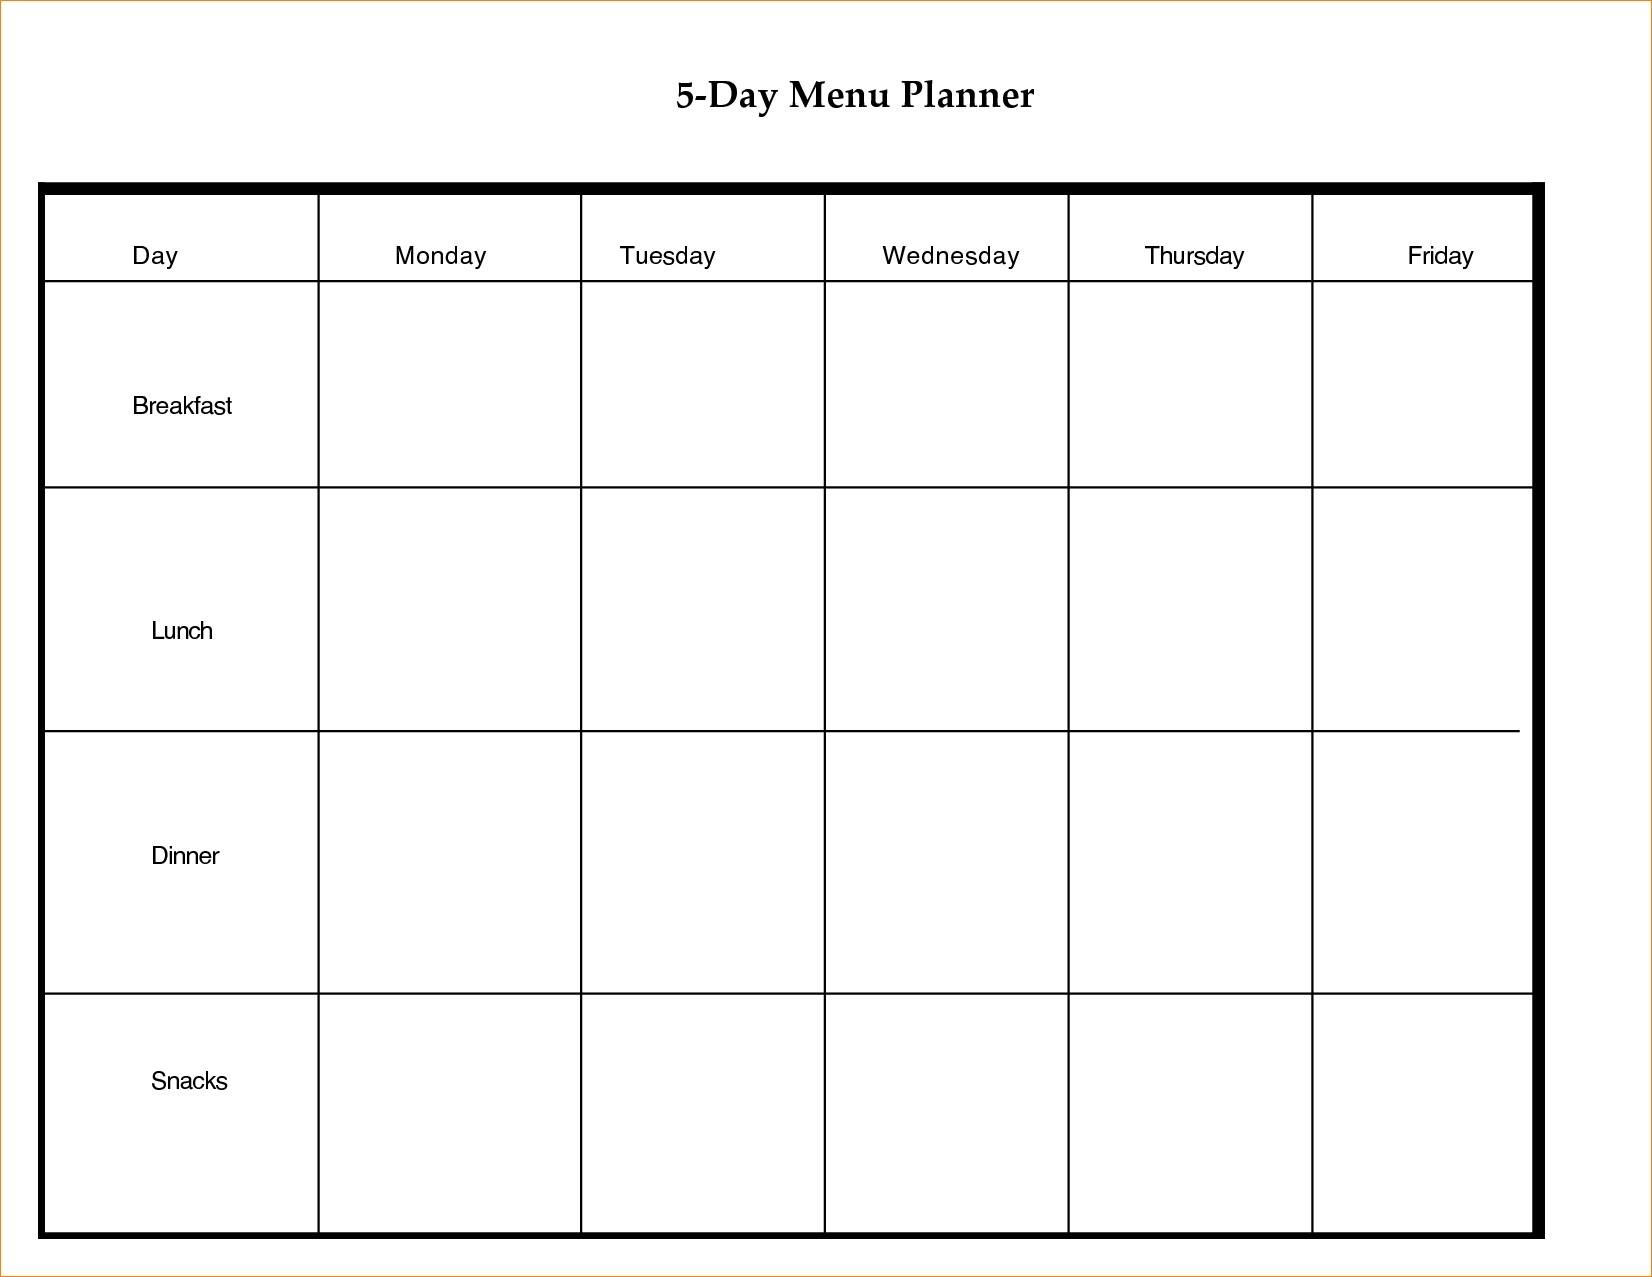 Printable 5 Day Calendar Blank Calendar Template 5 Day Week 0 8 With with regard to 5 Day Blank Calendar Template